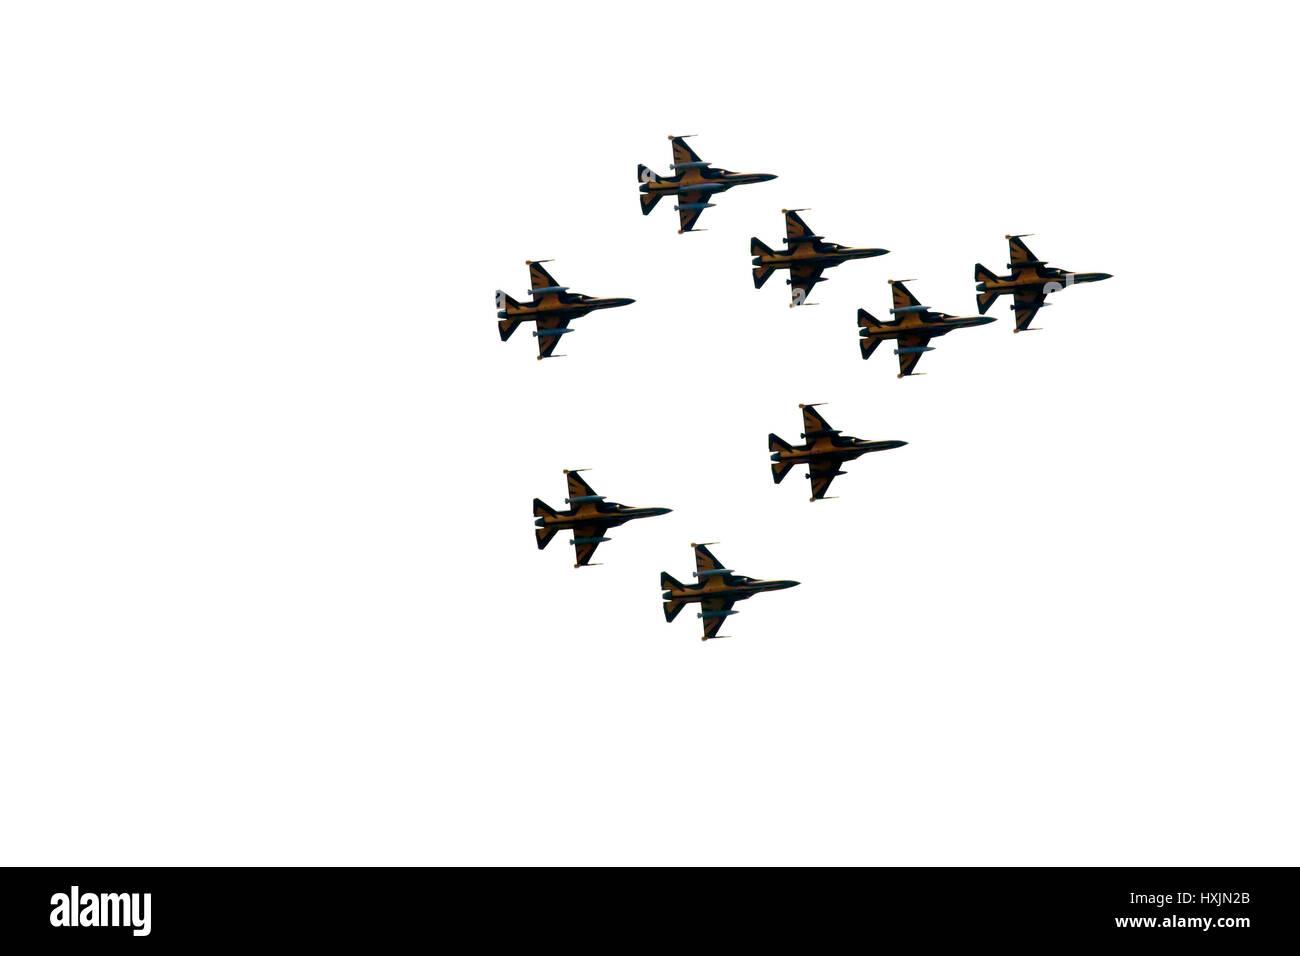 Kuala Lumpur, Malaysia. 29th Mar, 2017. The Republic of Korea Air Force Aerobatic Team (ROKAF T-50), Black Eagles, - Stock Image